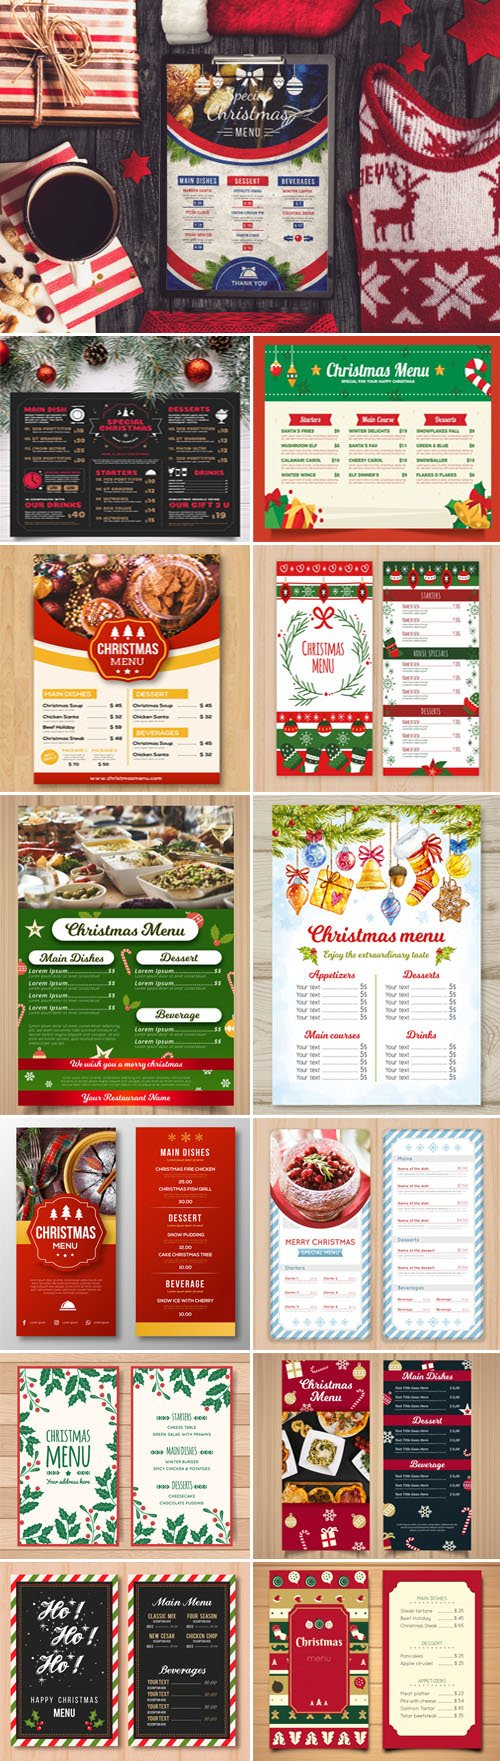 Christmas Menus Vector Templates Collection 1